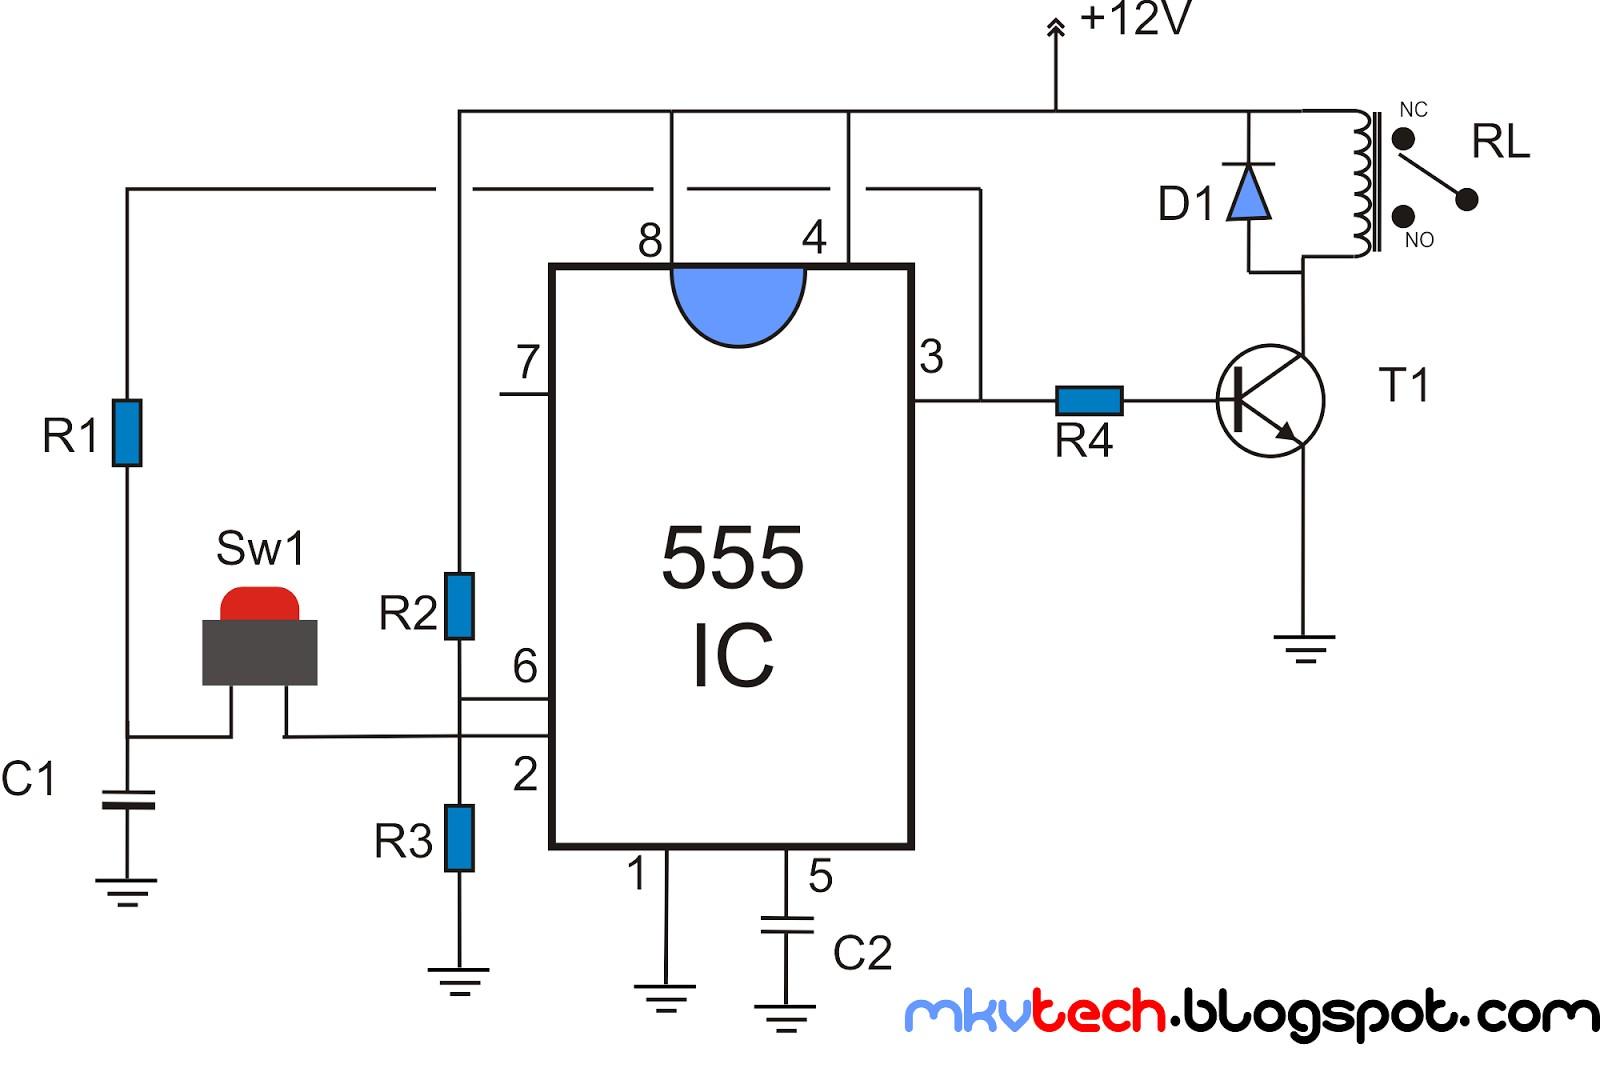 latching relay using 555 ic